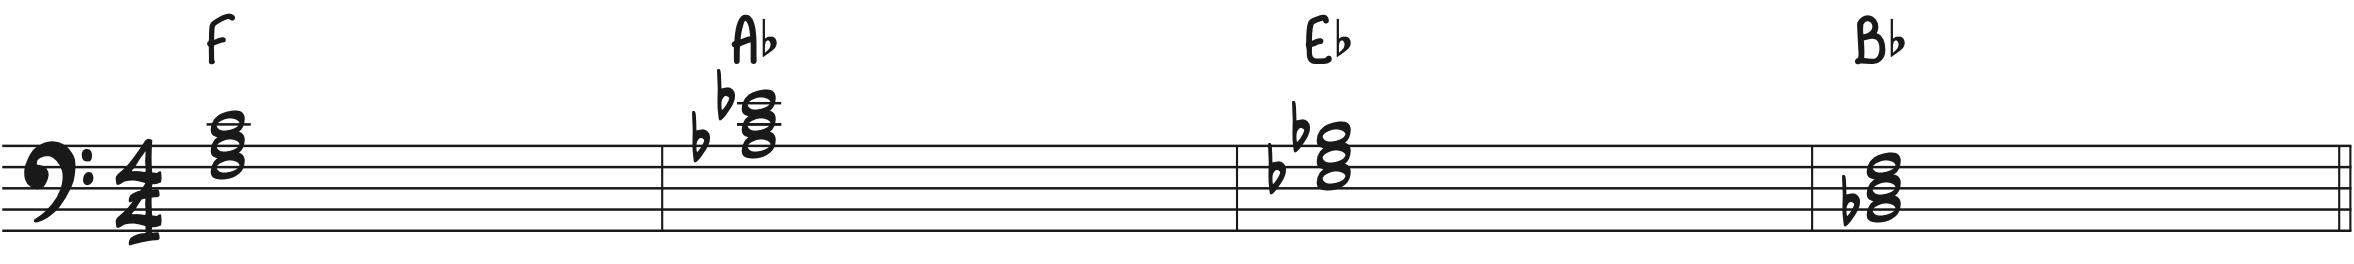 Hans Zimmer Chord Progression Film Score Movie Progression